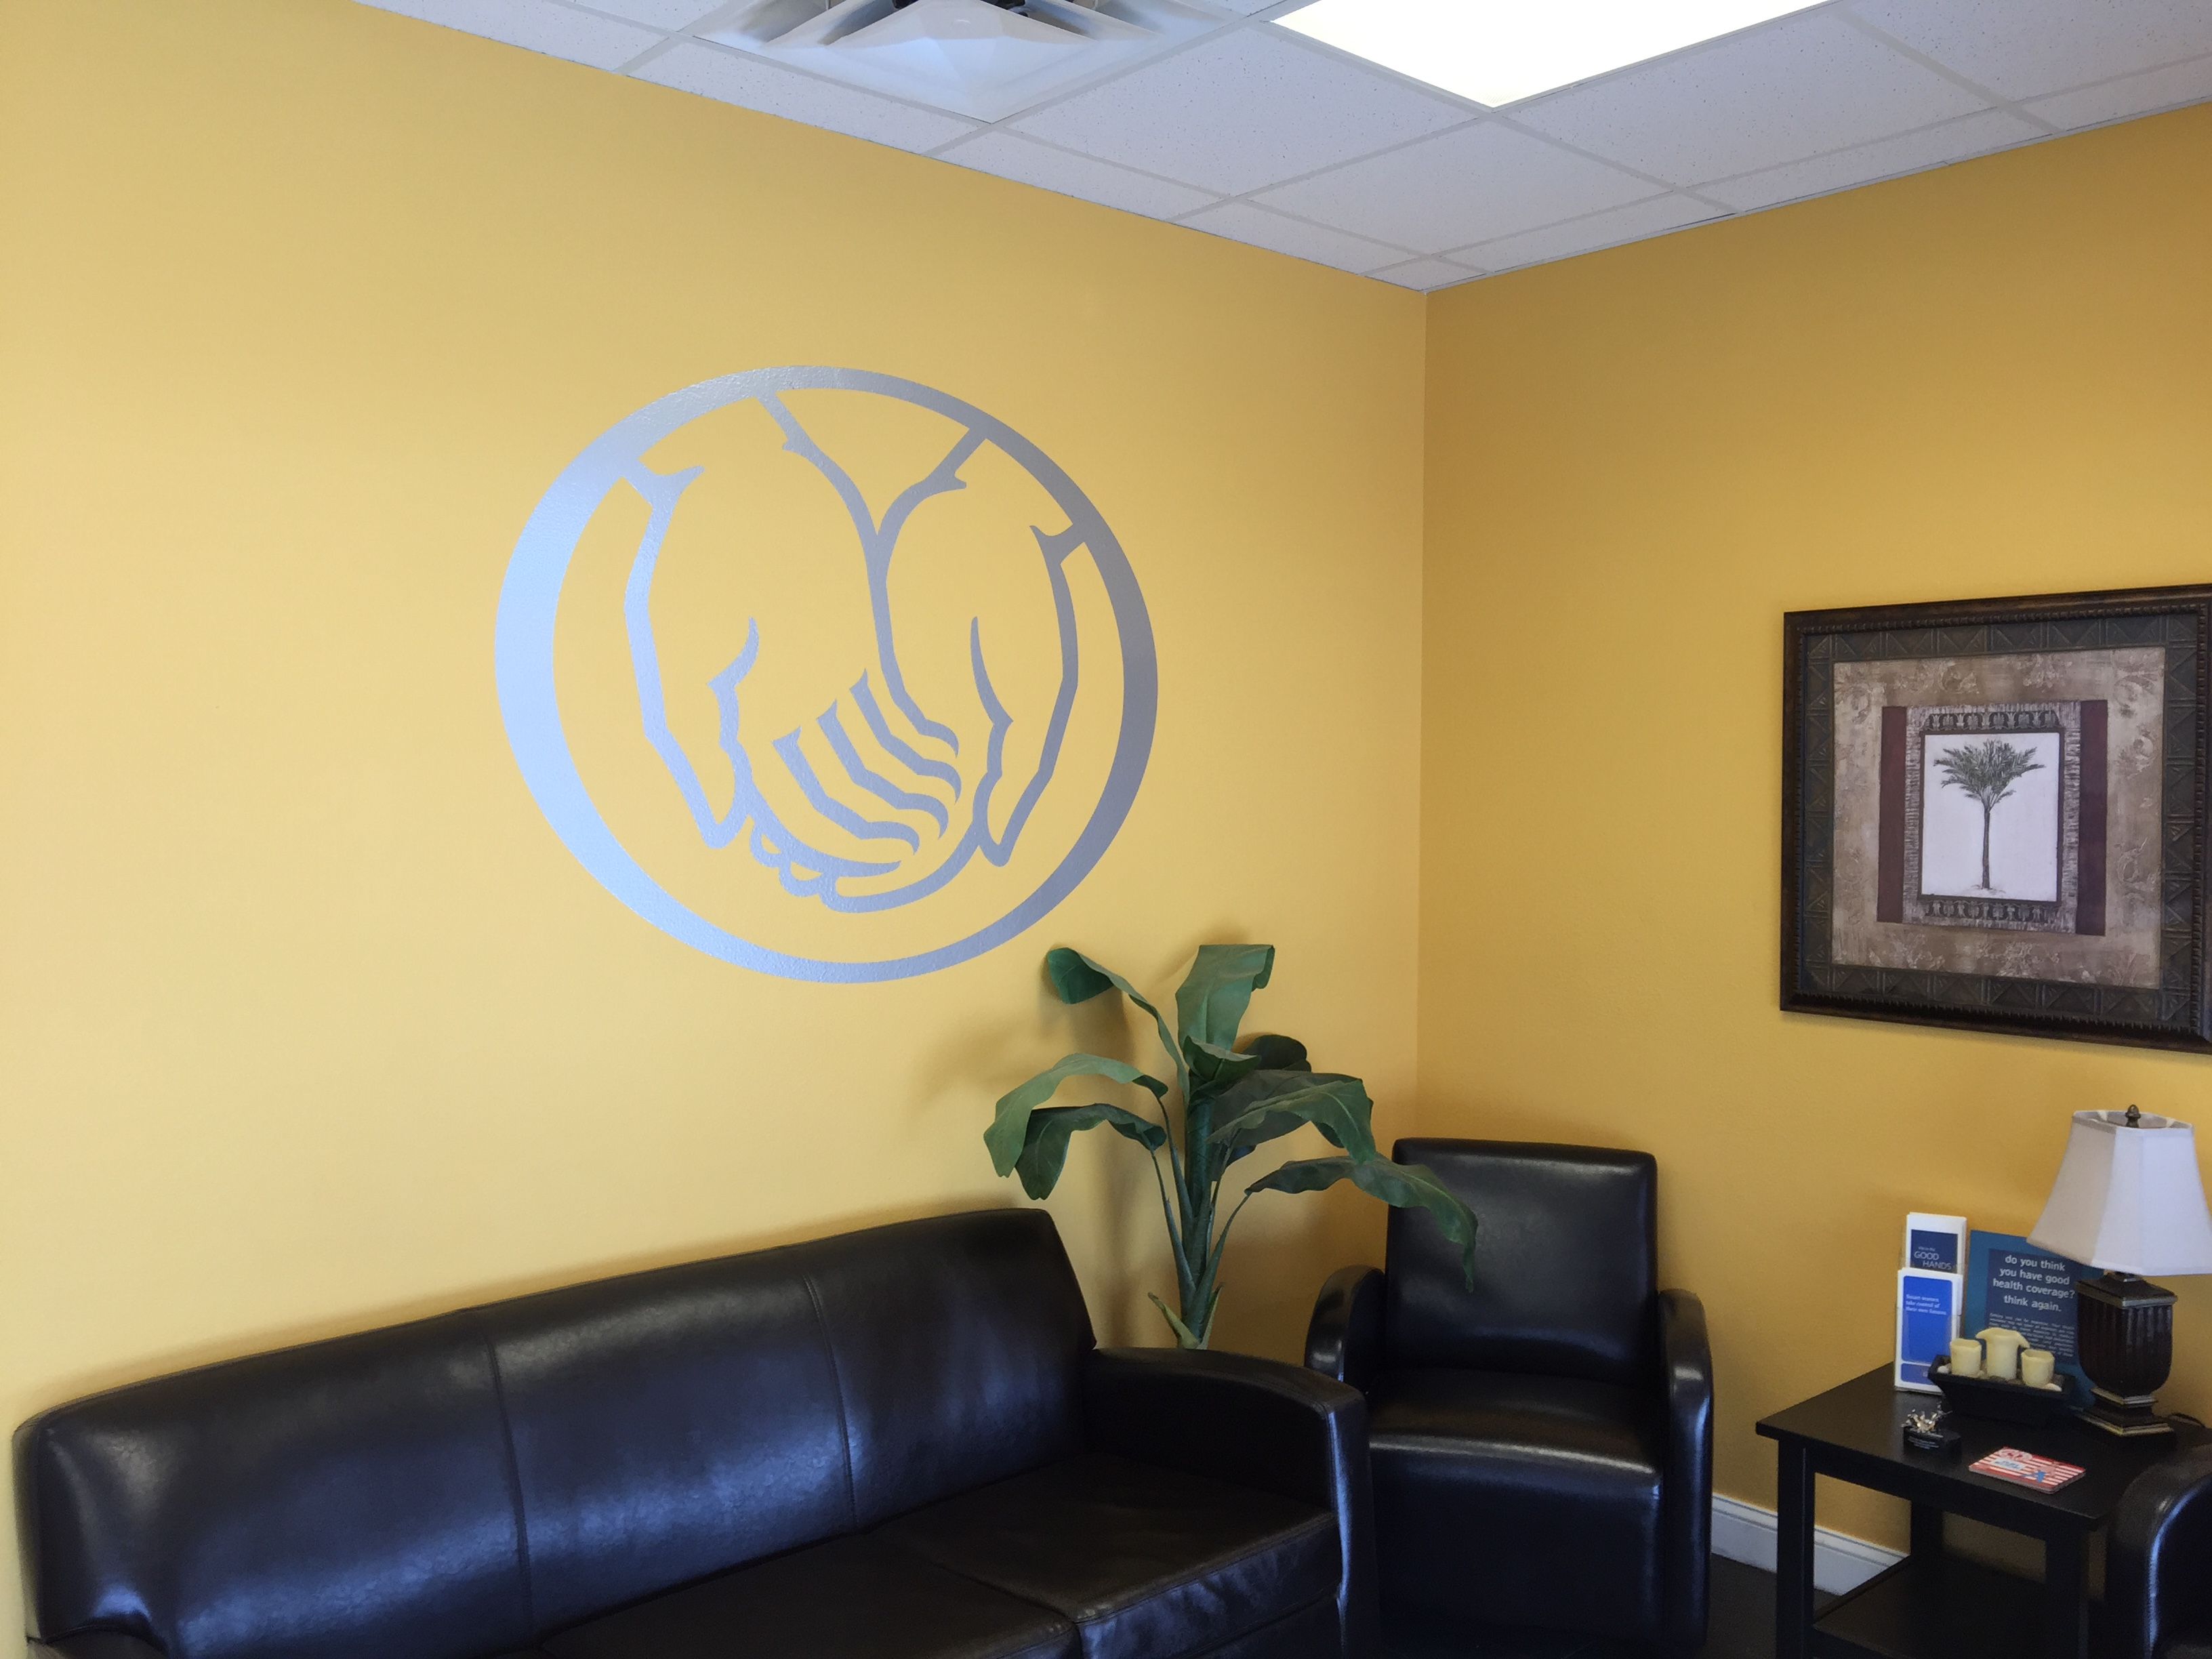 Scott Woodruff: Allstate Insurance image 3